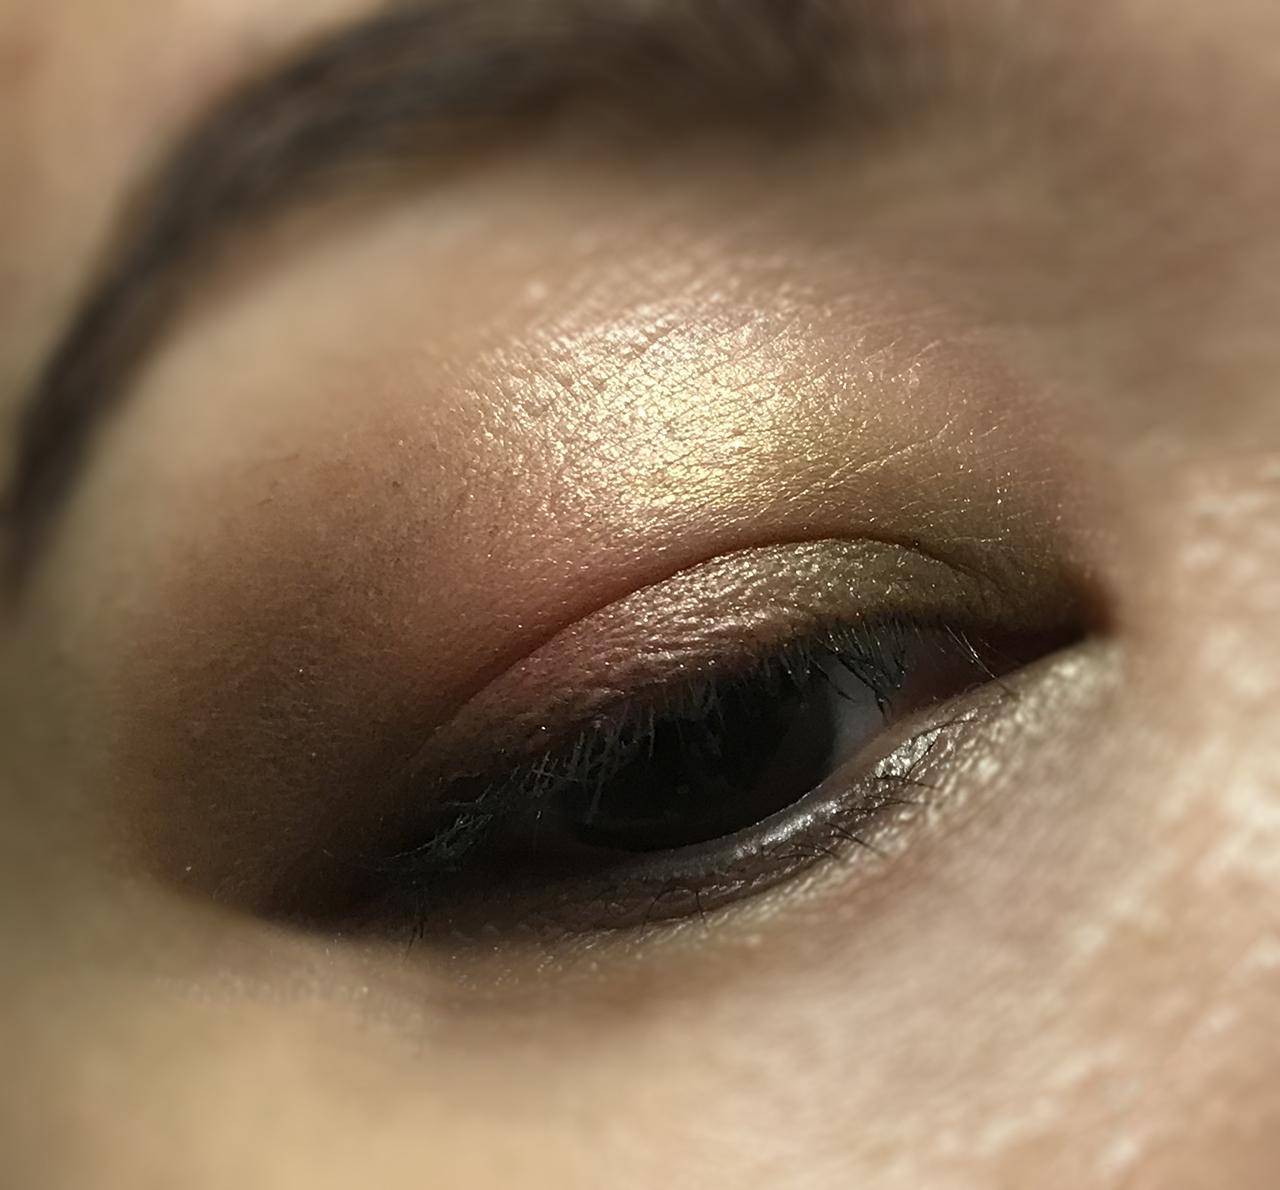 SUQQU Eyeshadow Compact 101 EOTD 2